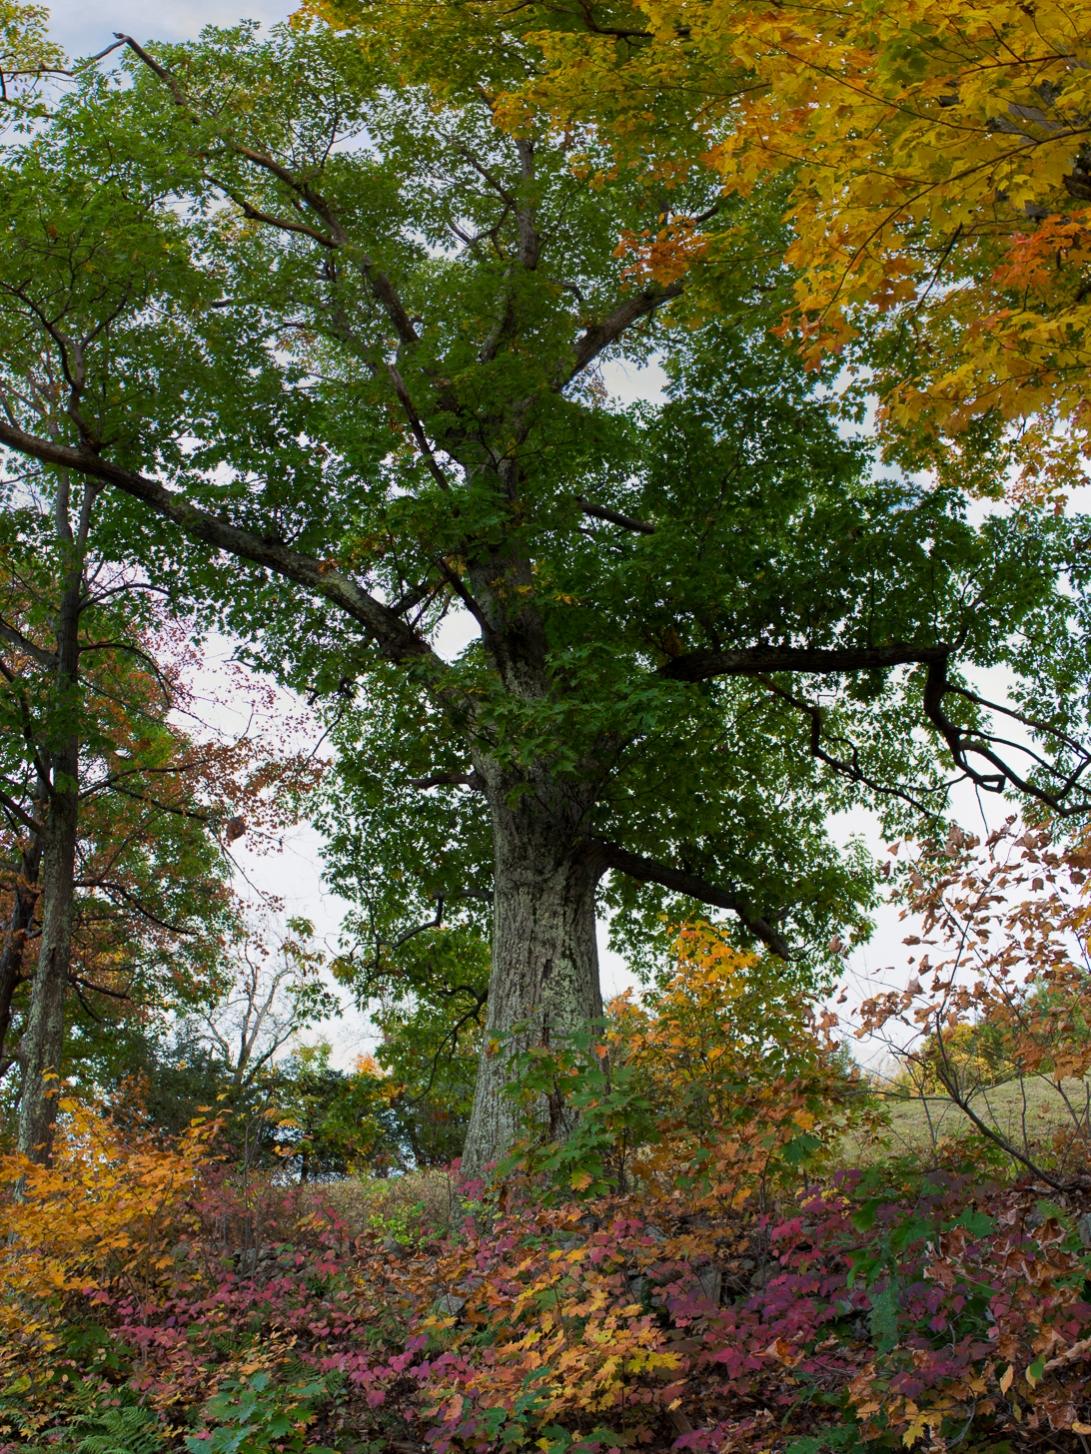 The Upper 27 Knolls Road Red Oak